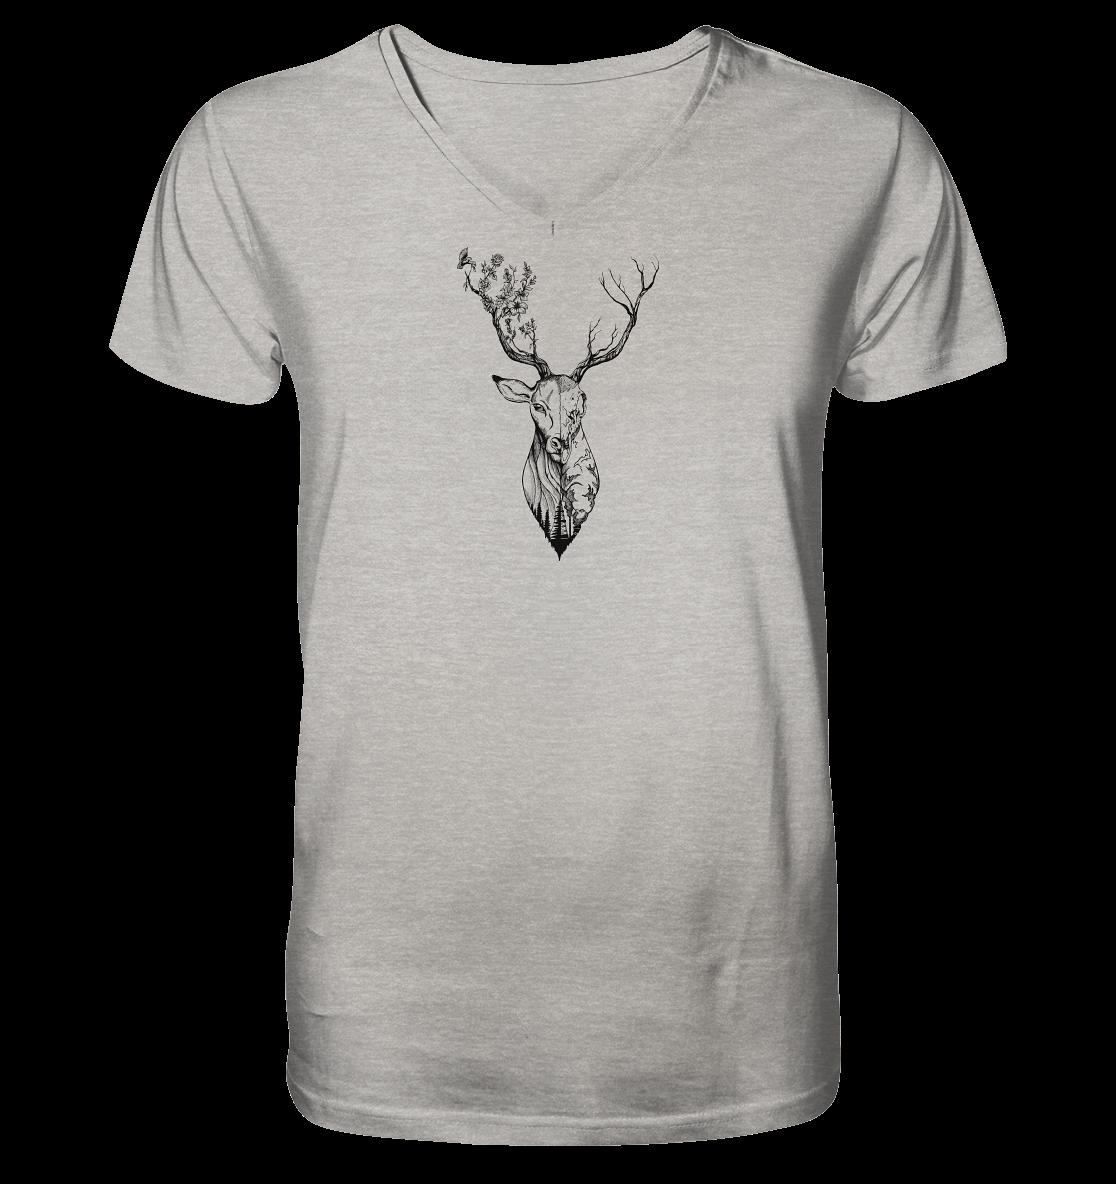 front-mens-organic-v-neck-shirt-c2c1c0-1116x-6.png